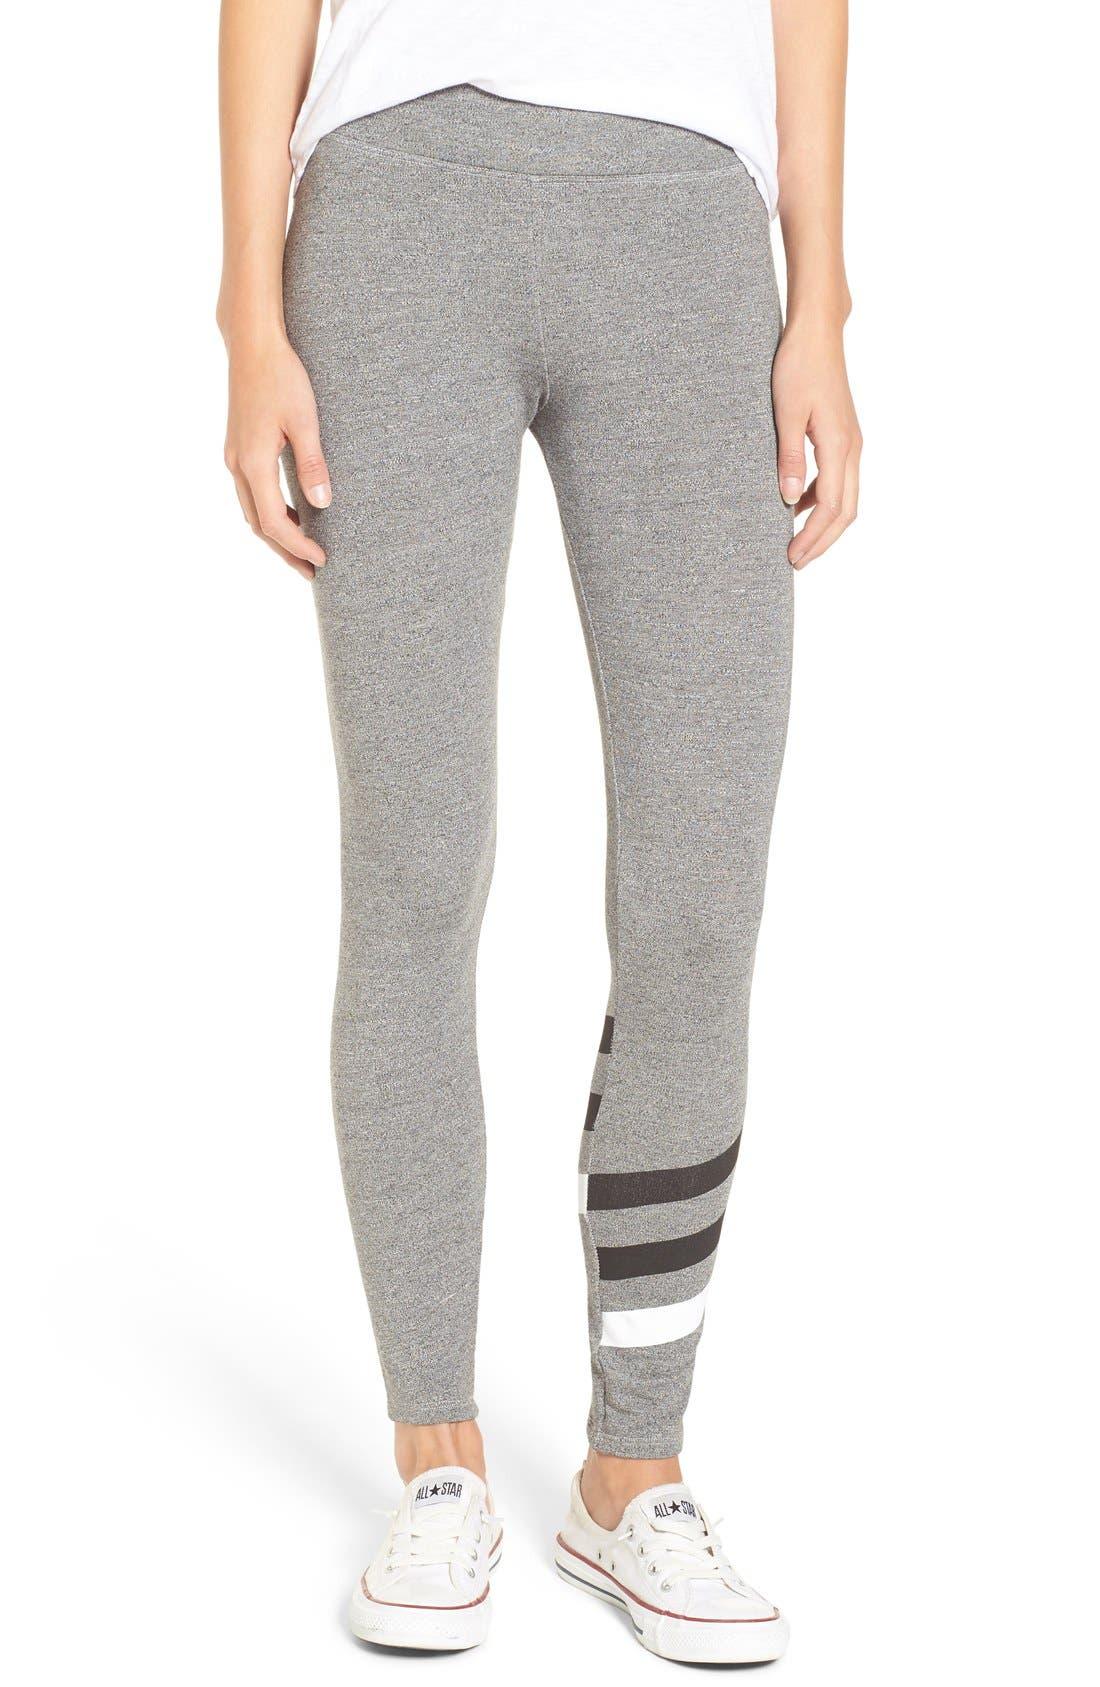 Alternate Image 1 Selected - Sundry 'Stripes' Yoga Pants